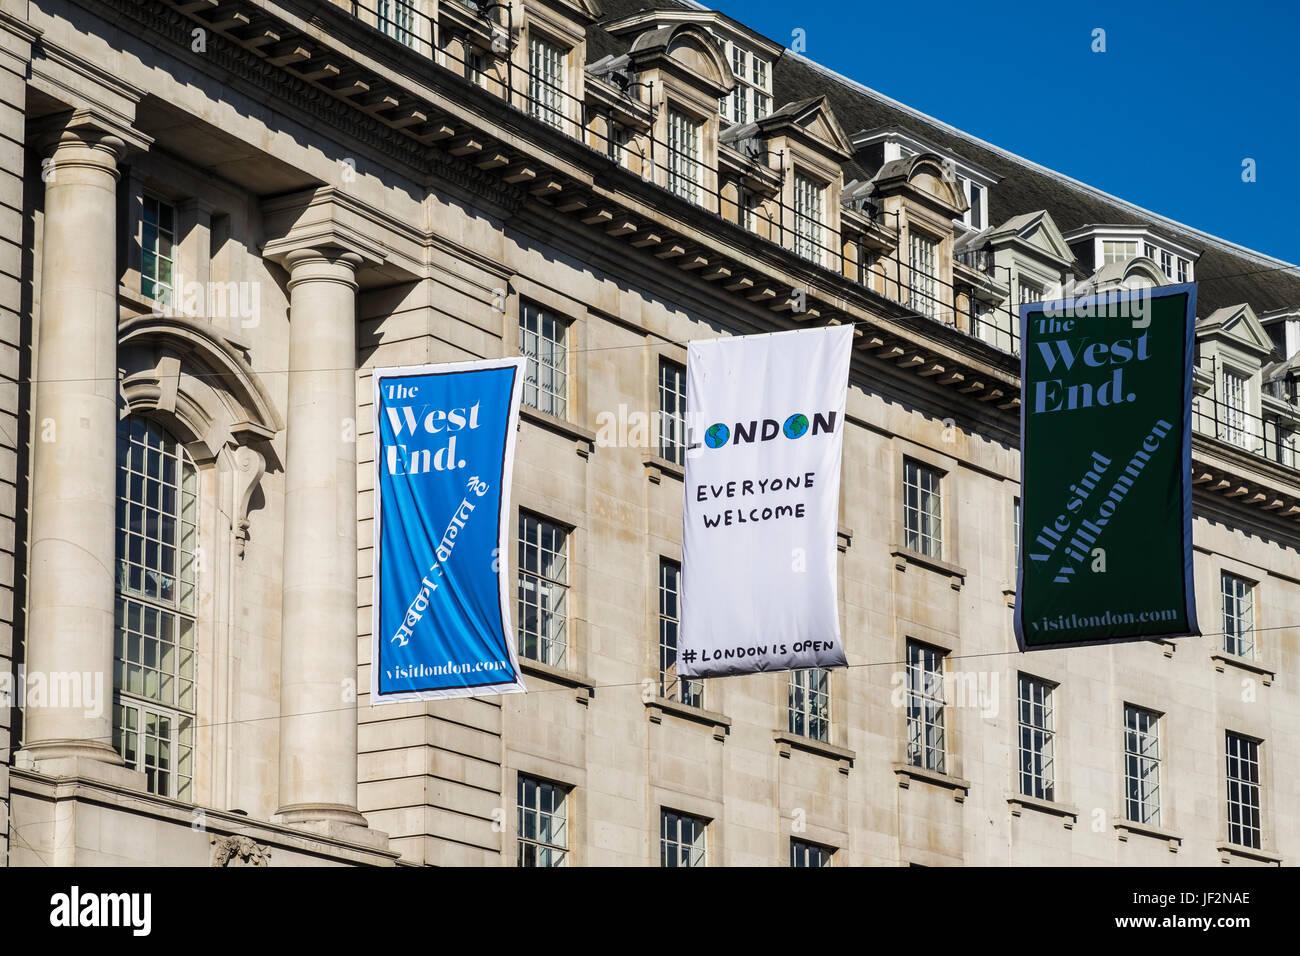 London everyone welcome & London is open banner across the street, London, England, U.K. - Stock Image